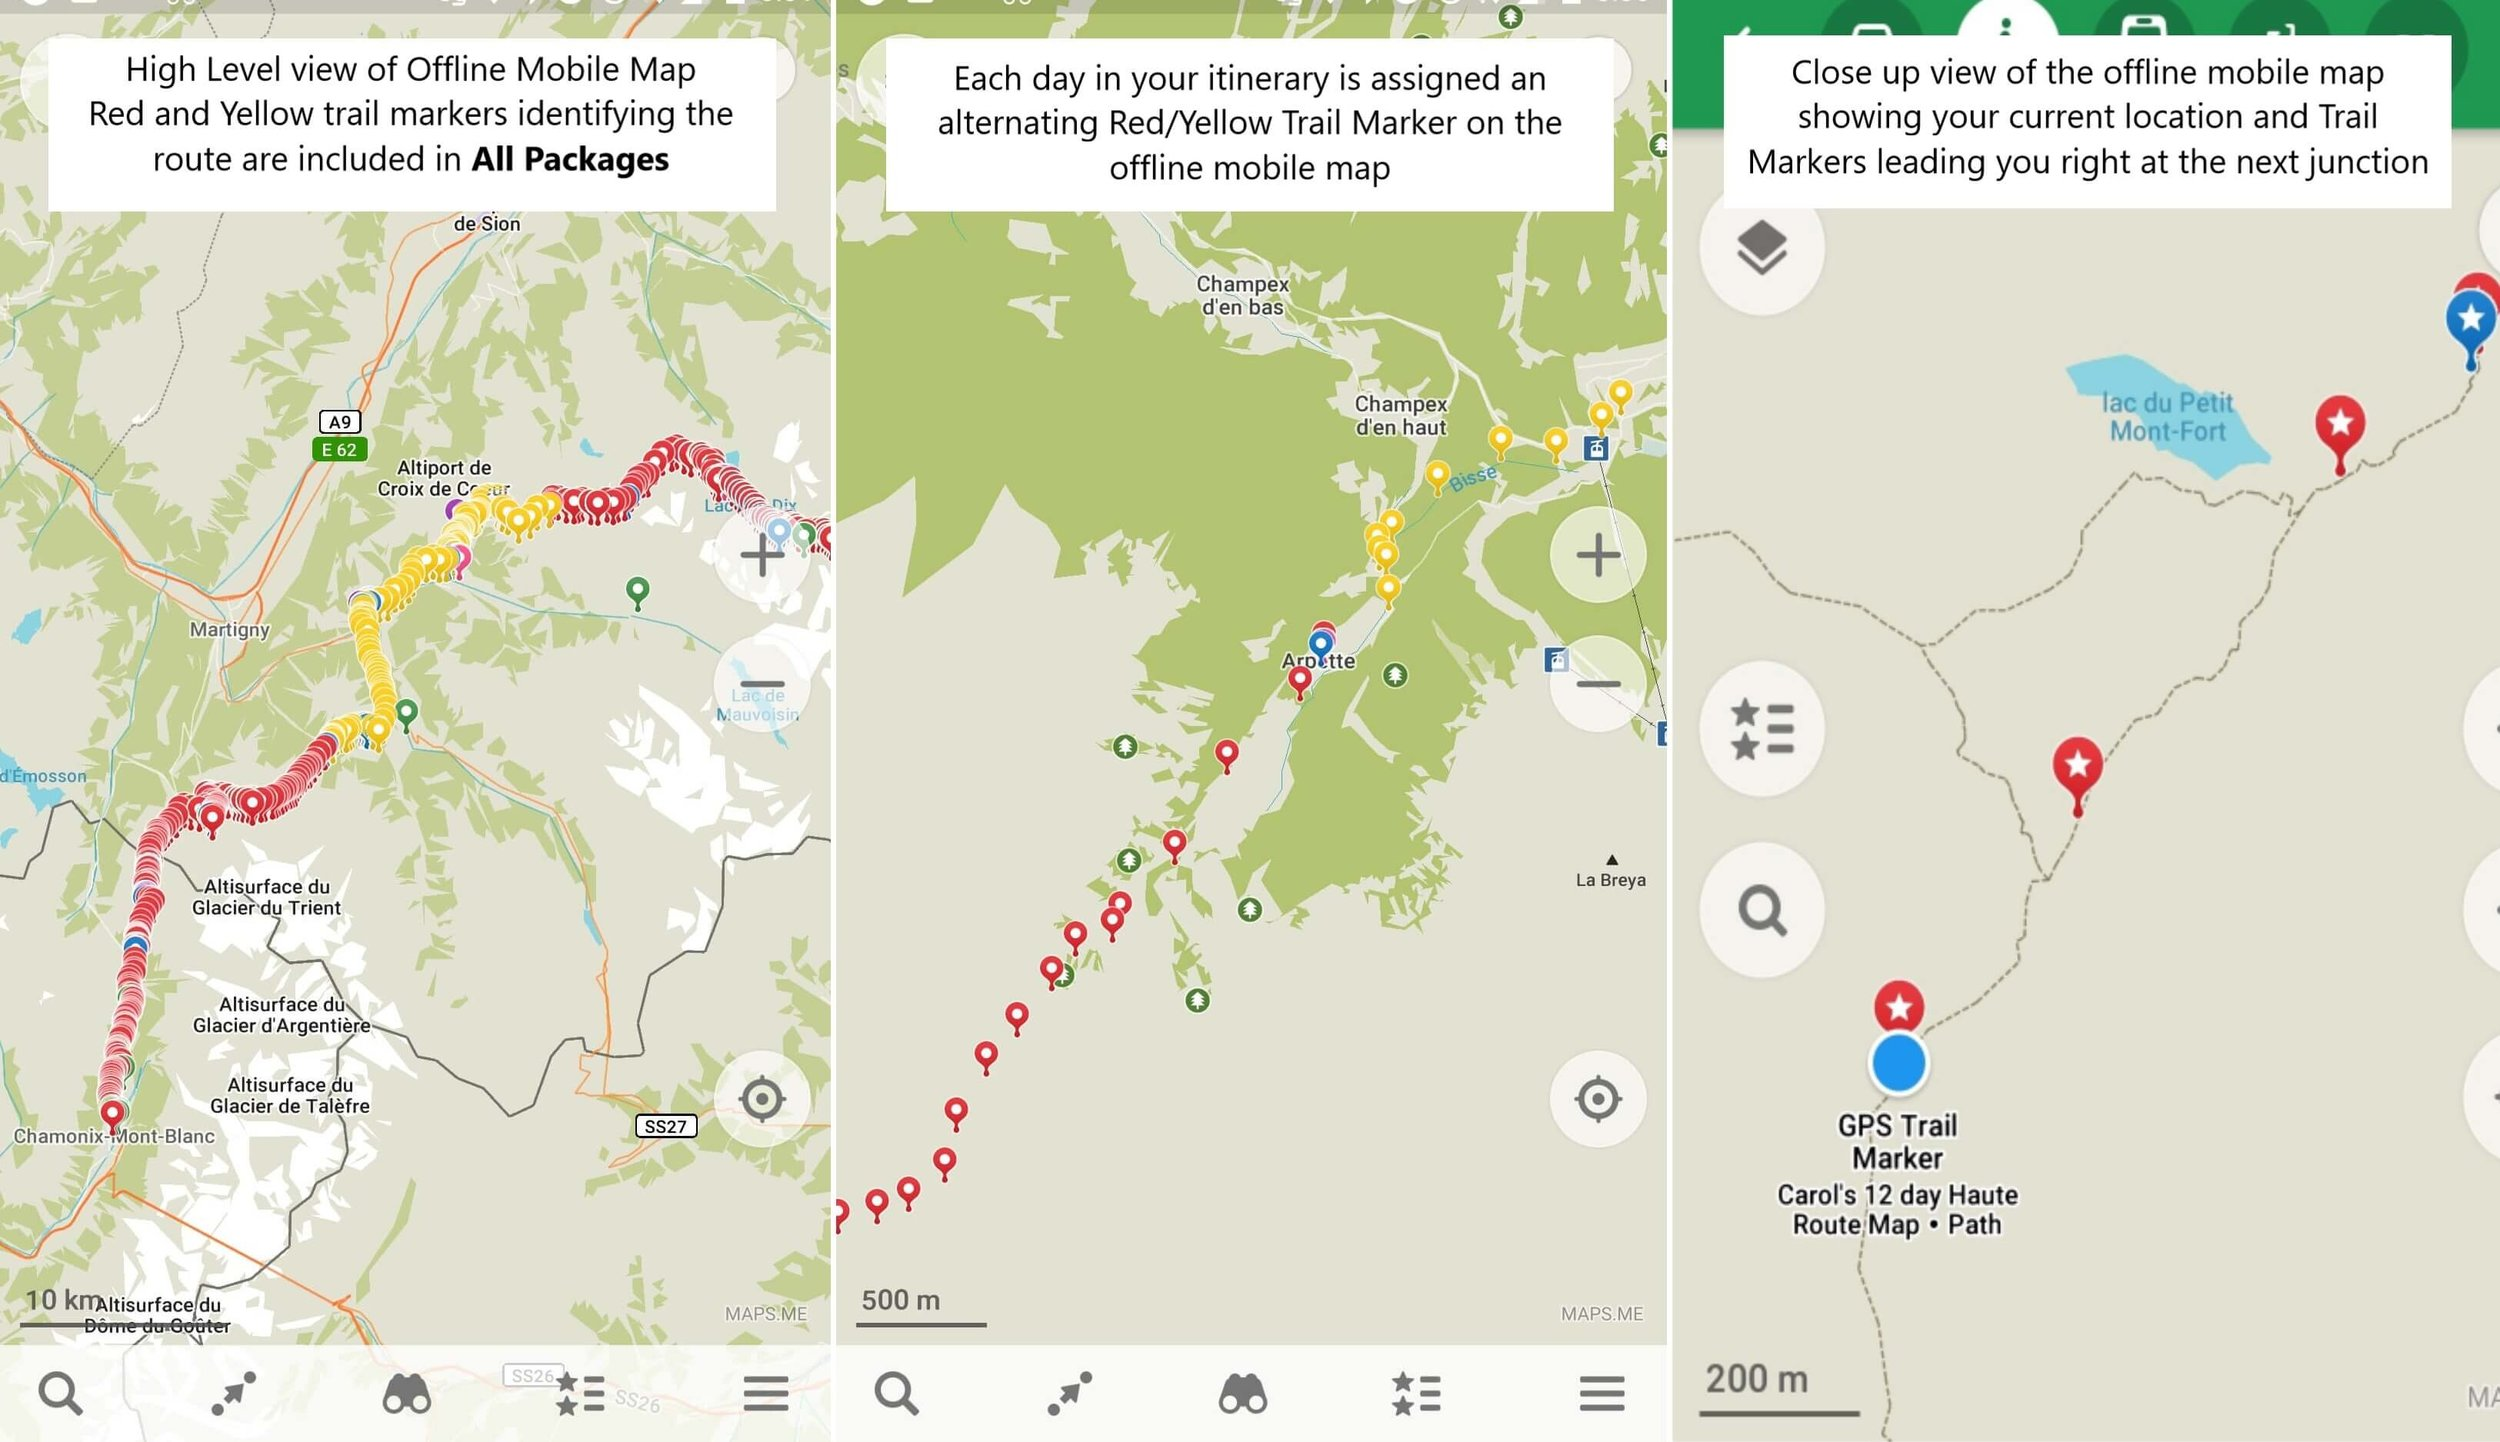 Offline Mobile Maps